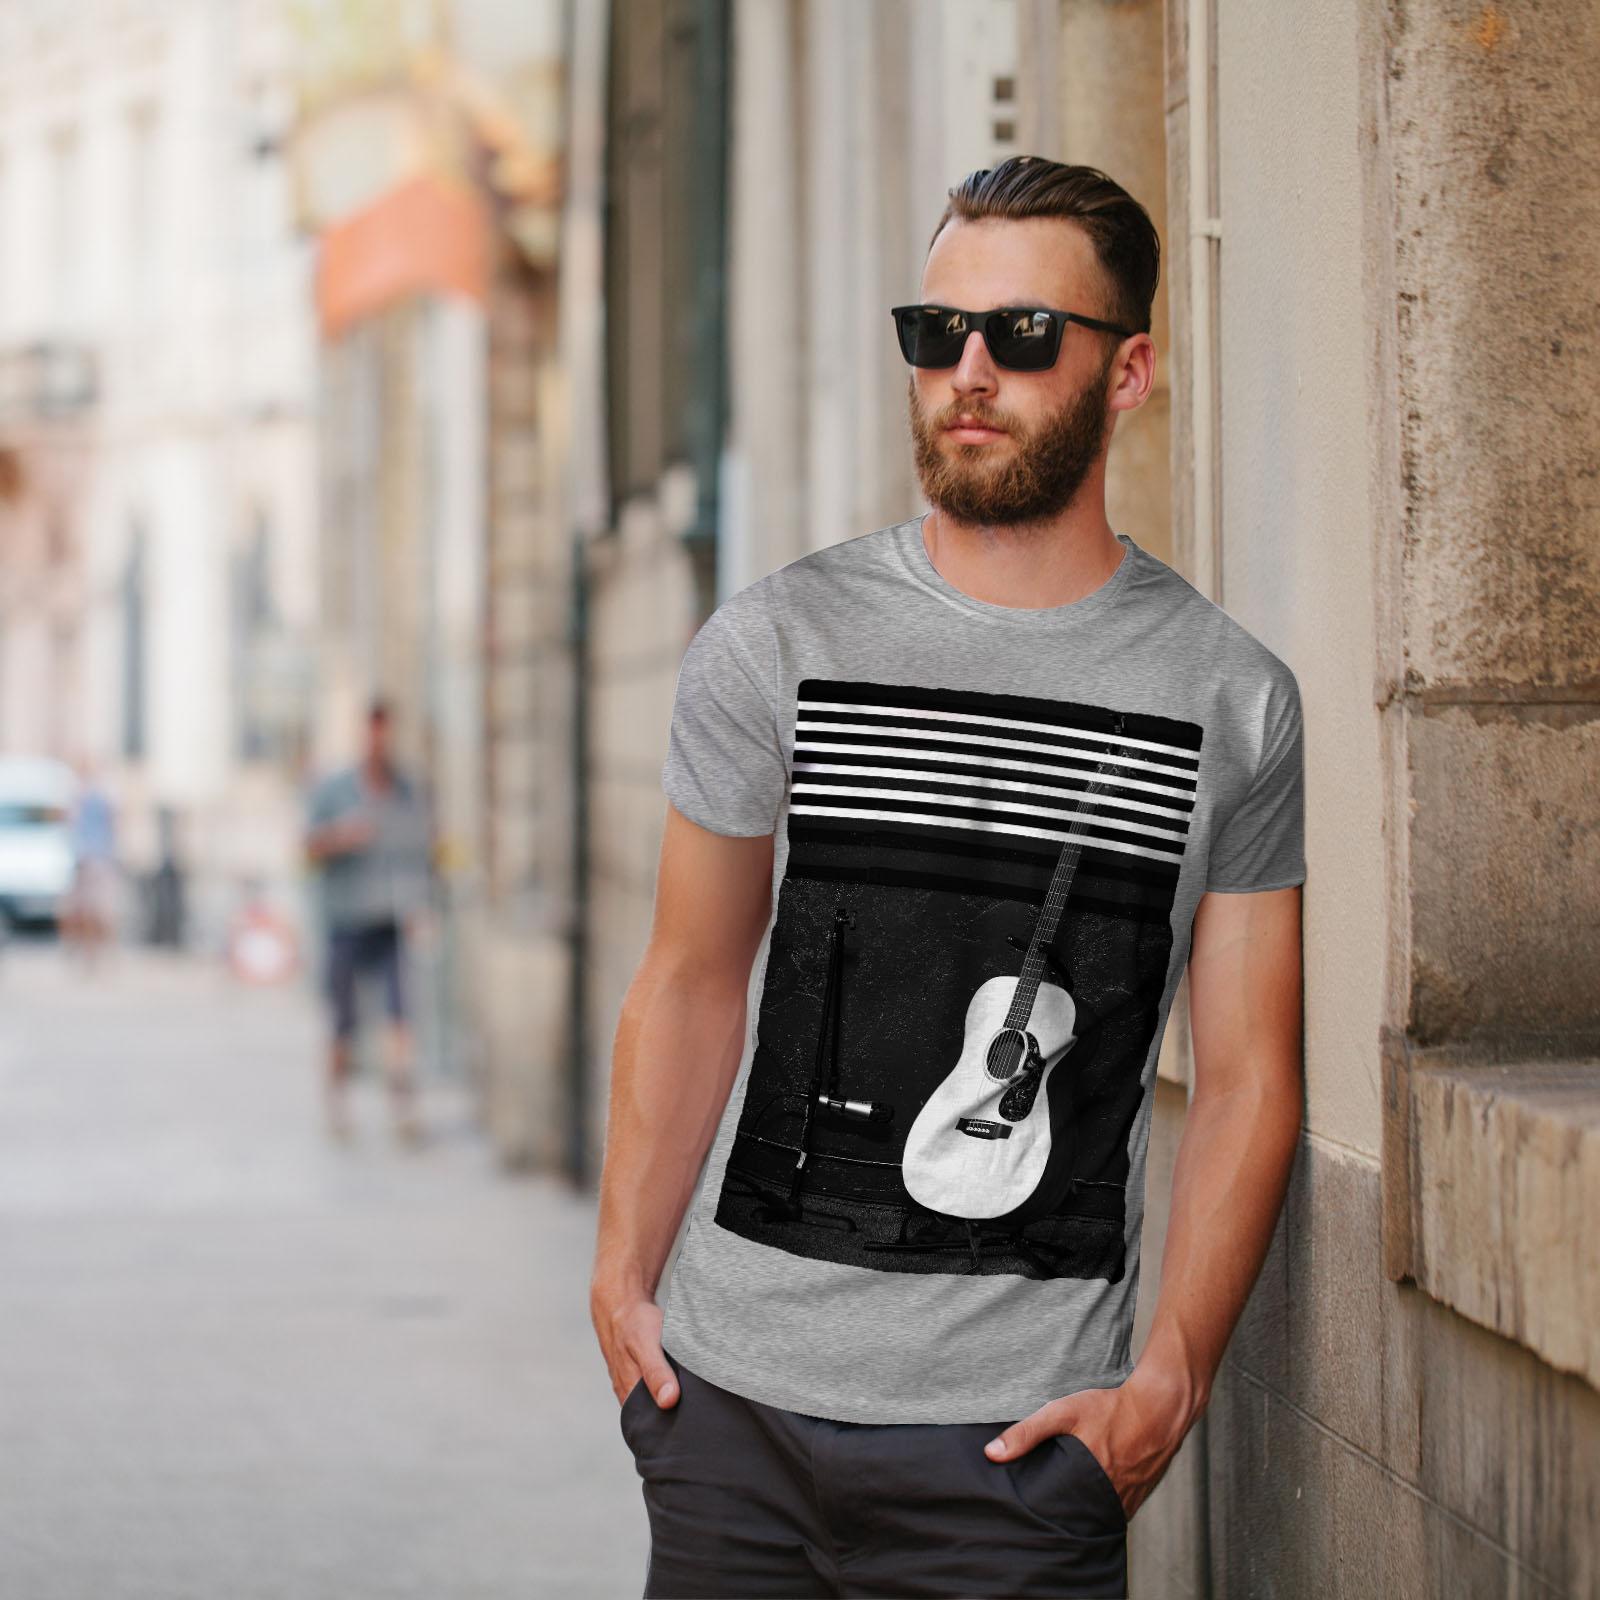 Wellcoda Acoustic Guitar Mens T-shirt Music Graphic Design Printed Tee